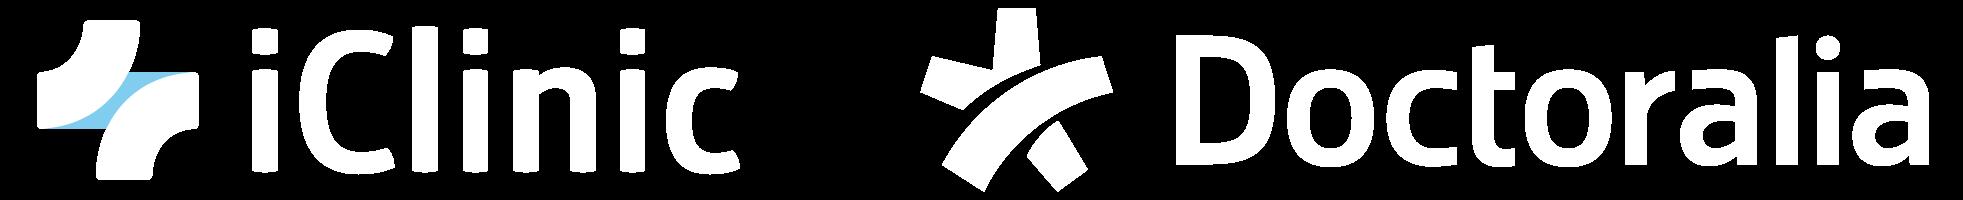 logo-iclinic-doctoralia